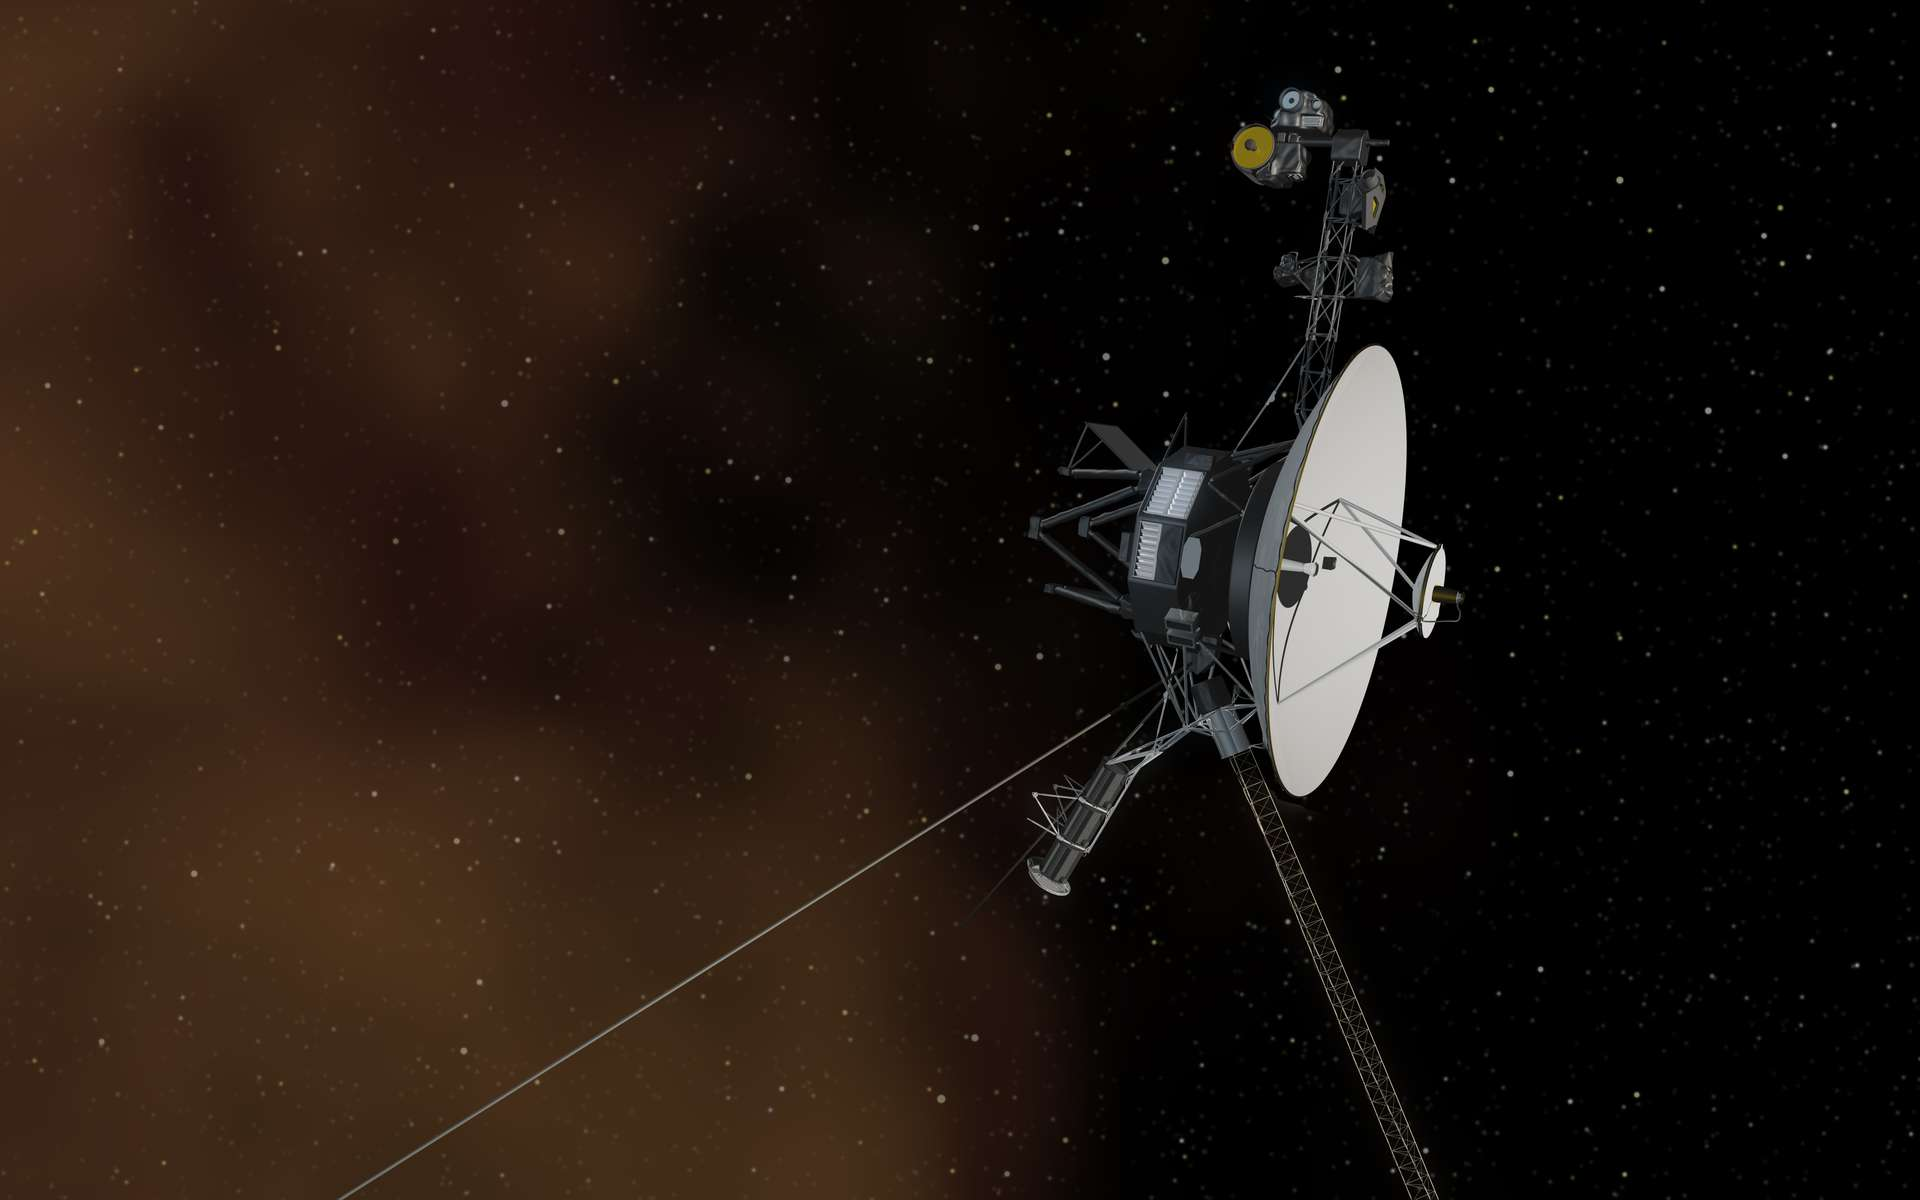 La sonde Voyager. © Nasa, JPL